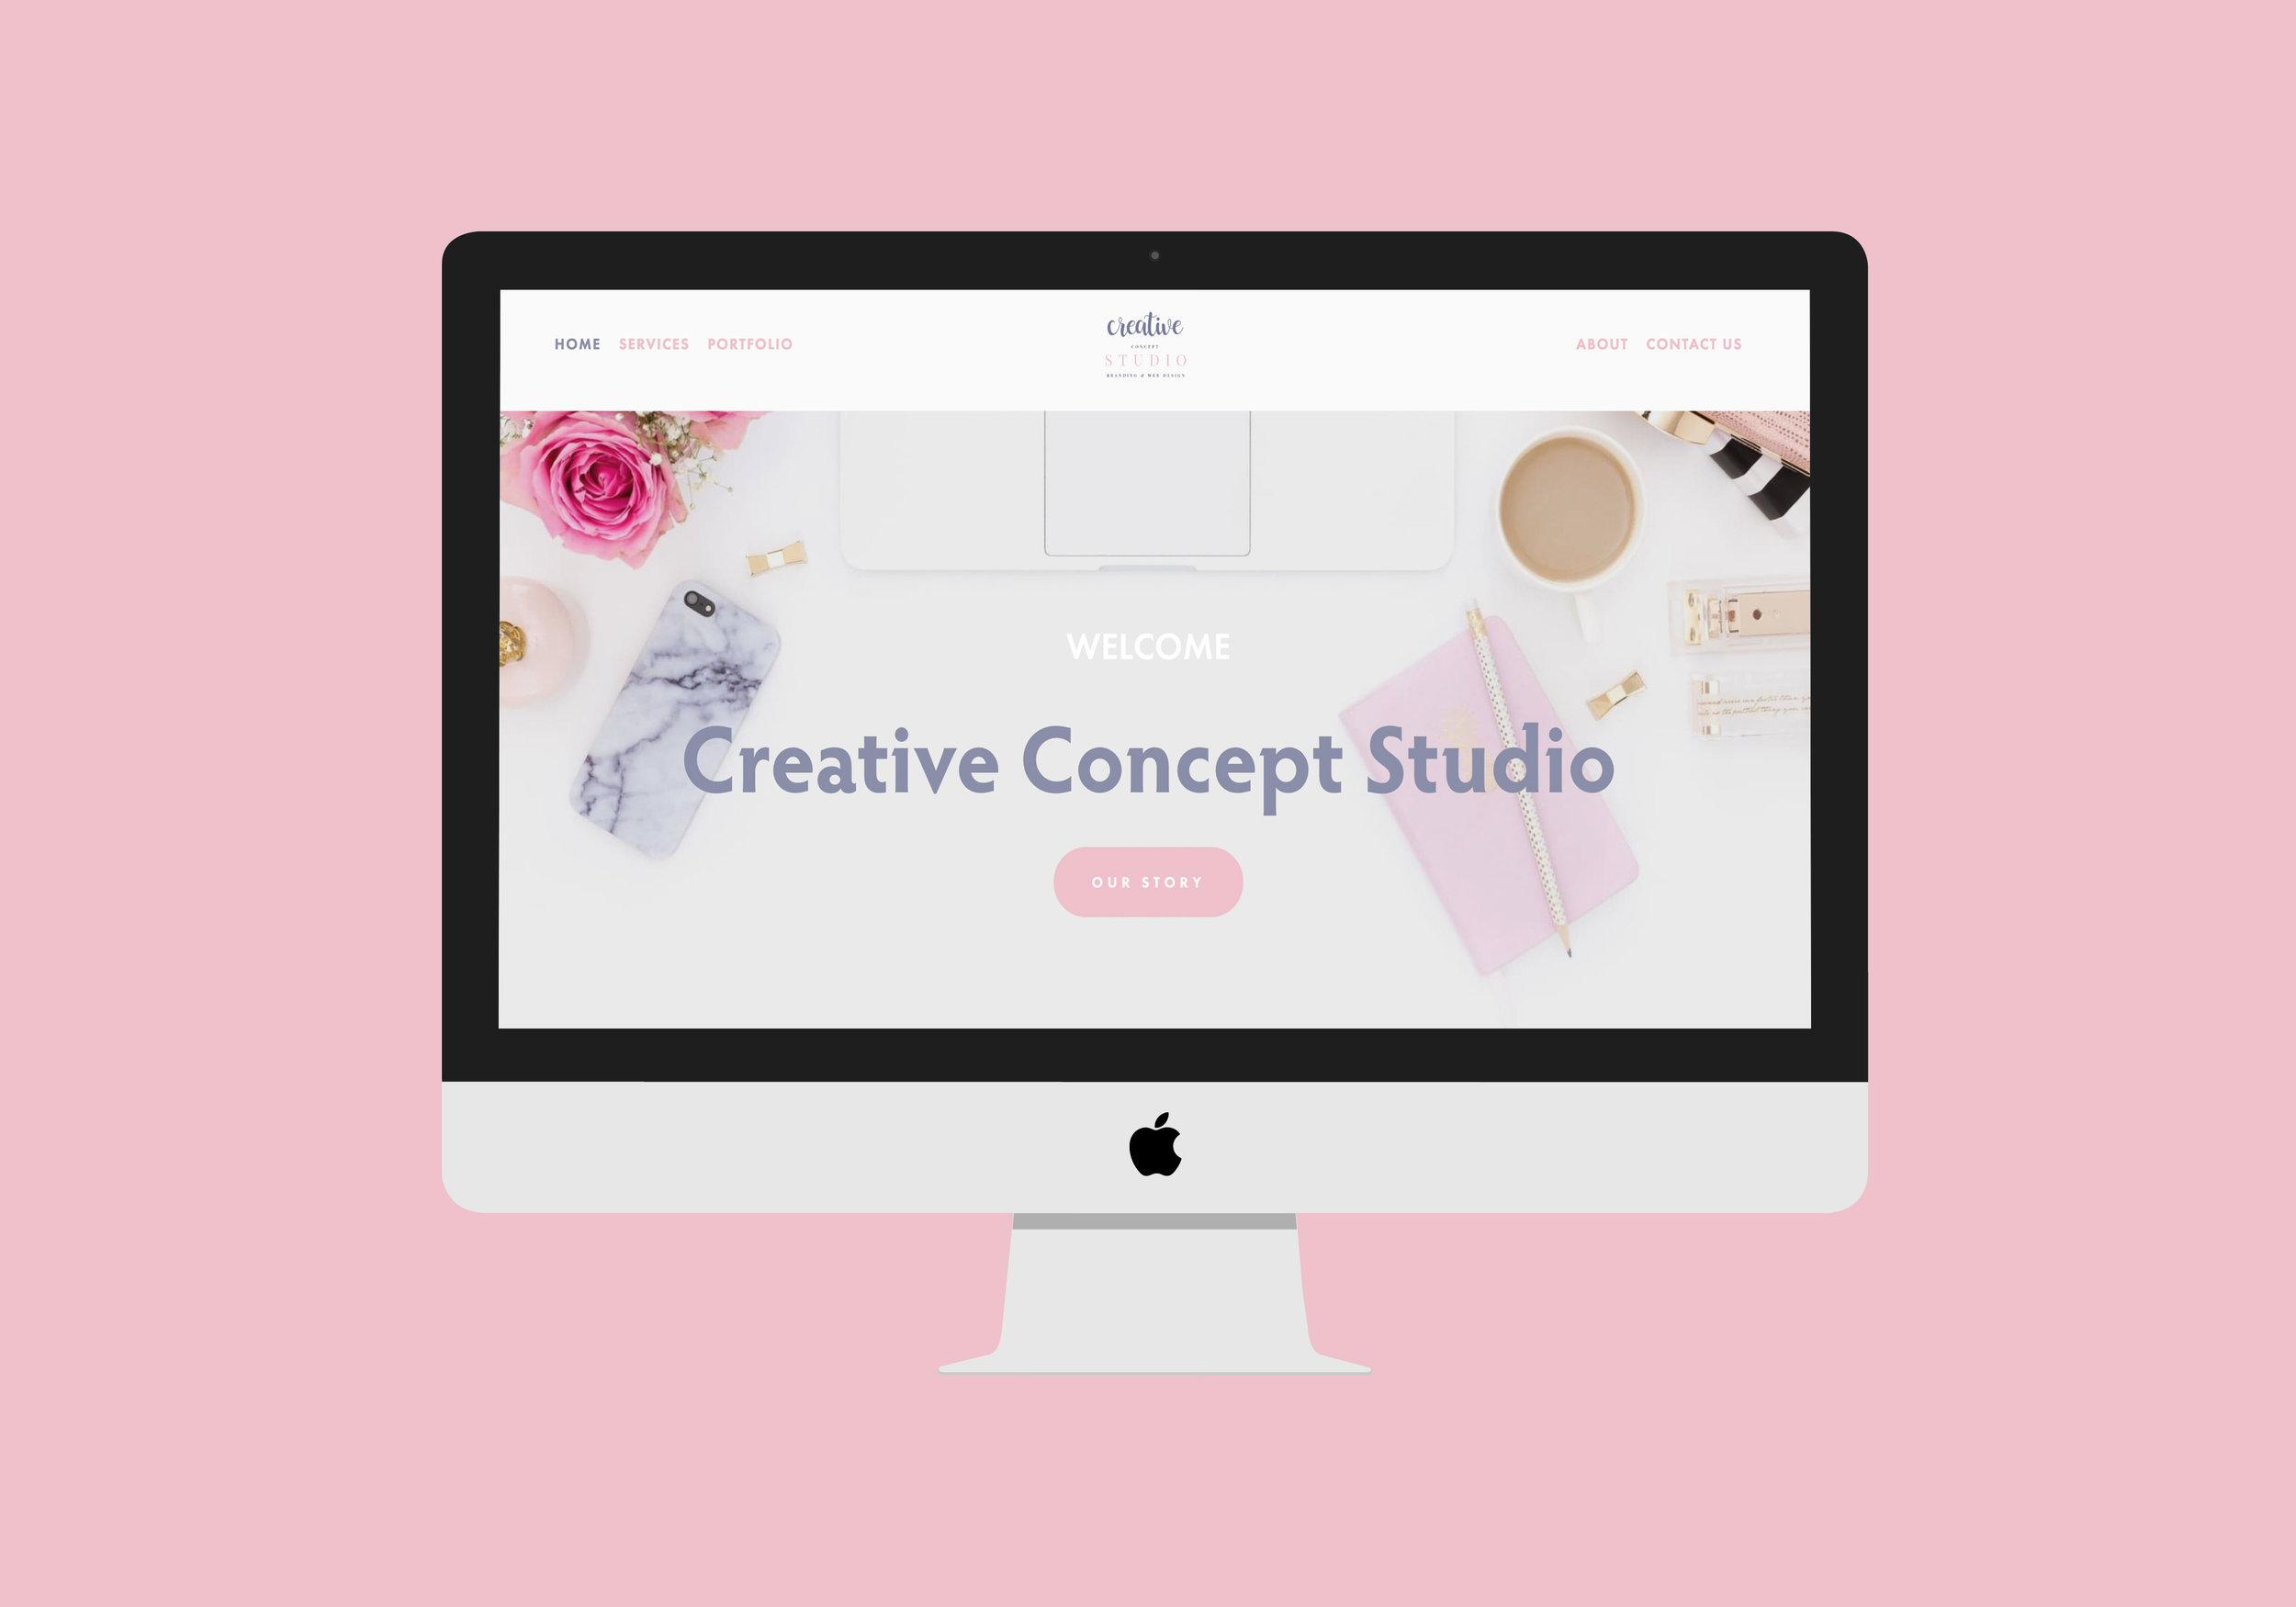 creative-concept-studio-homepage.jpg